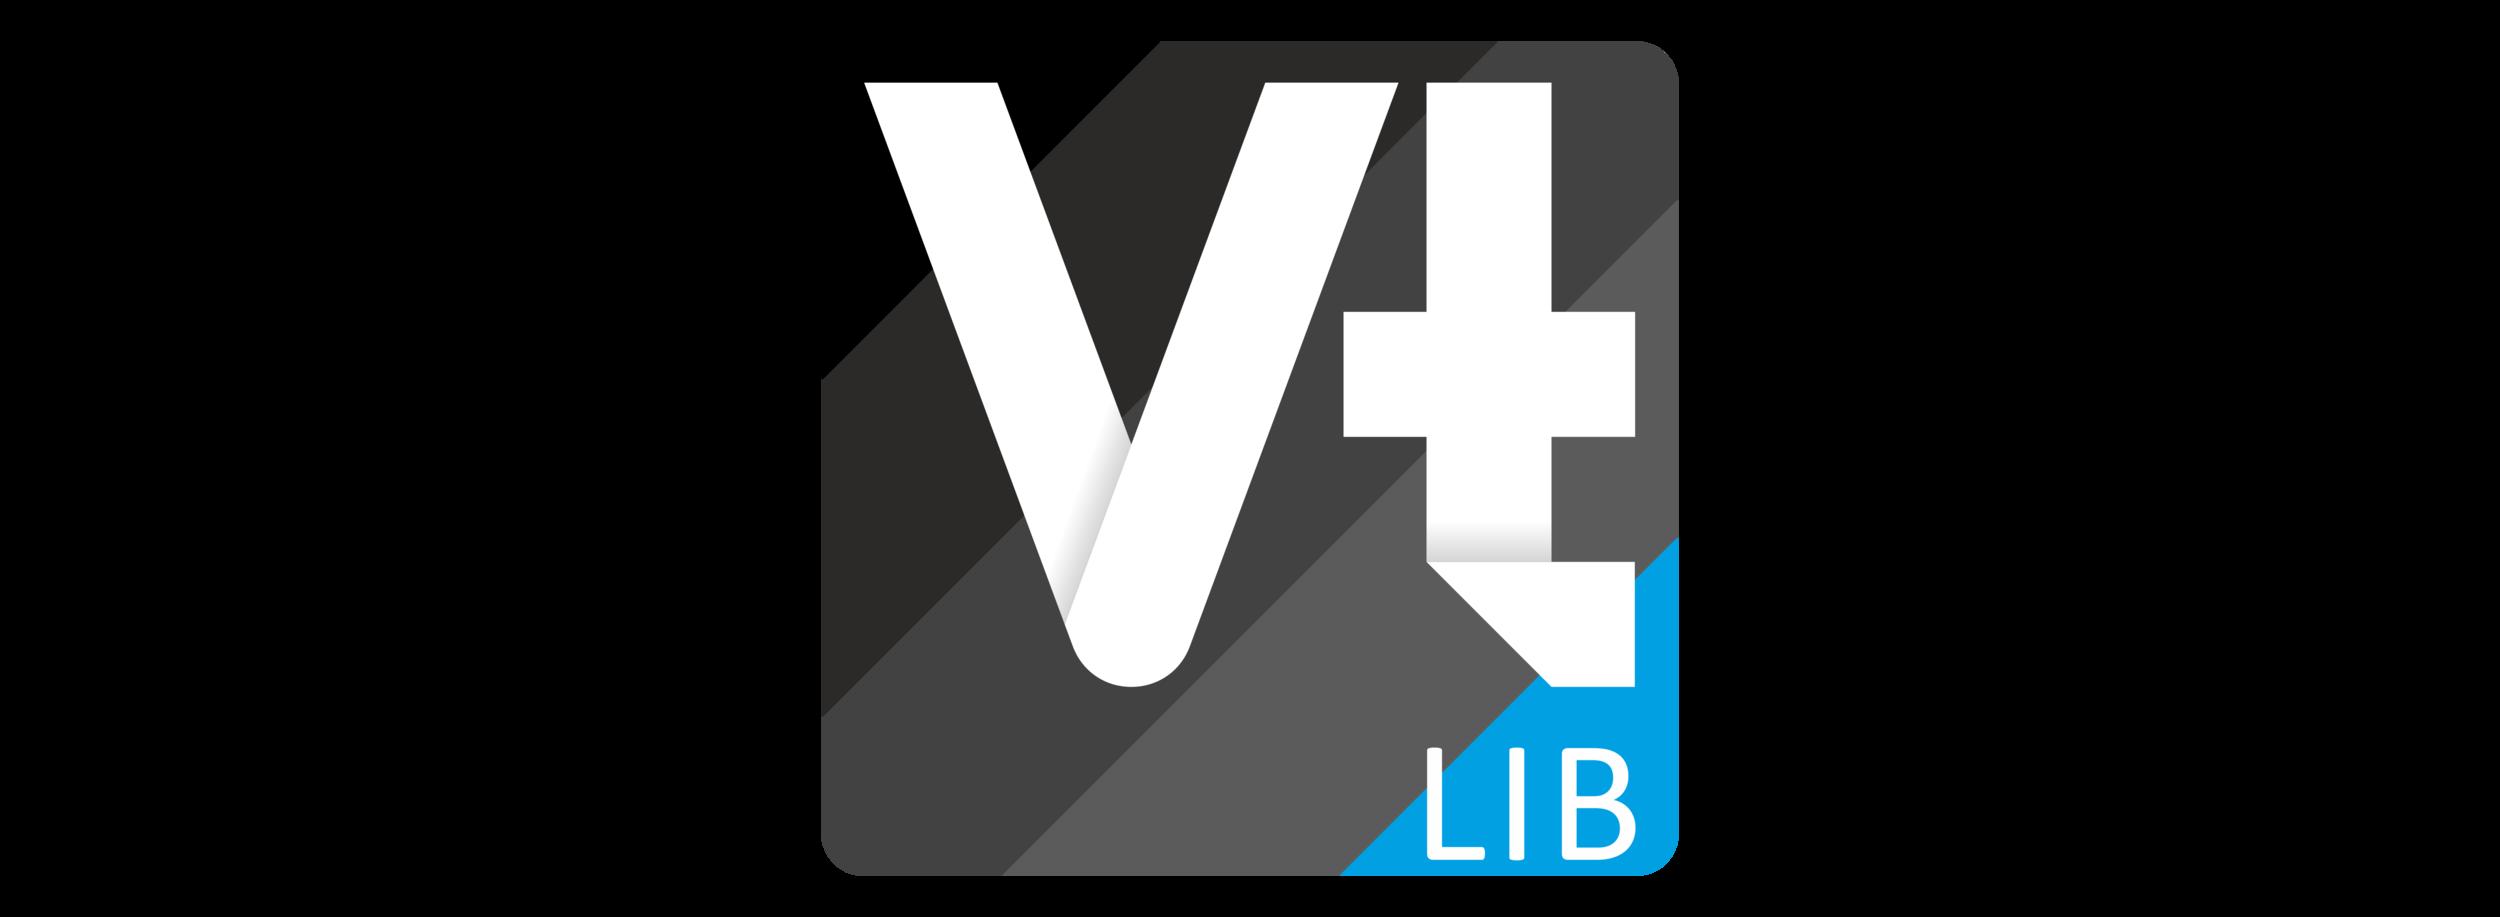 videotracker_wide_logo.png